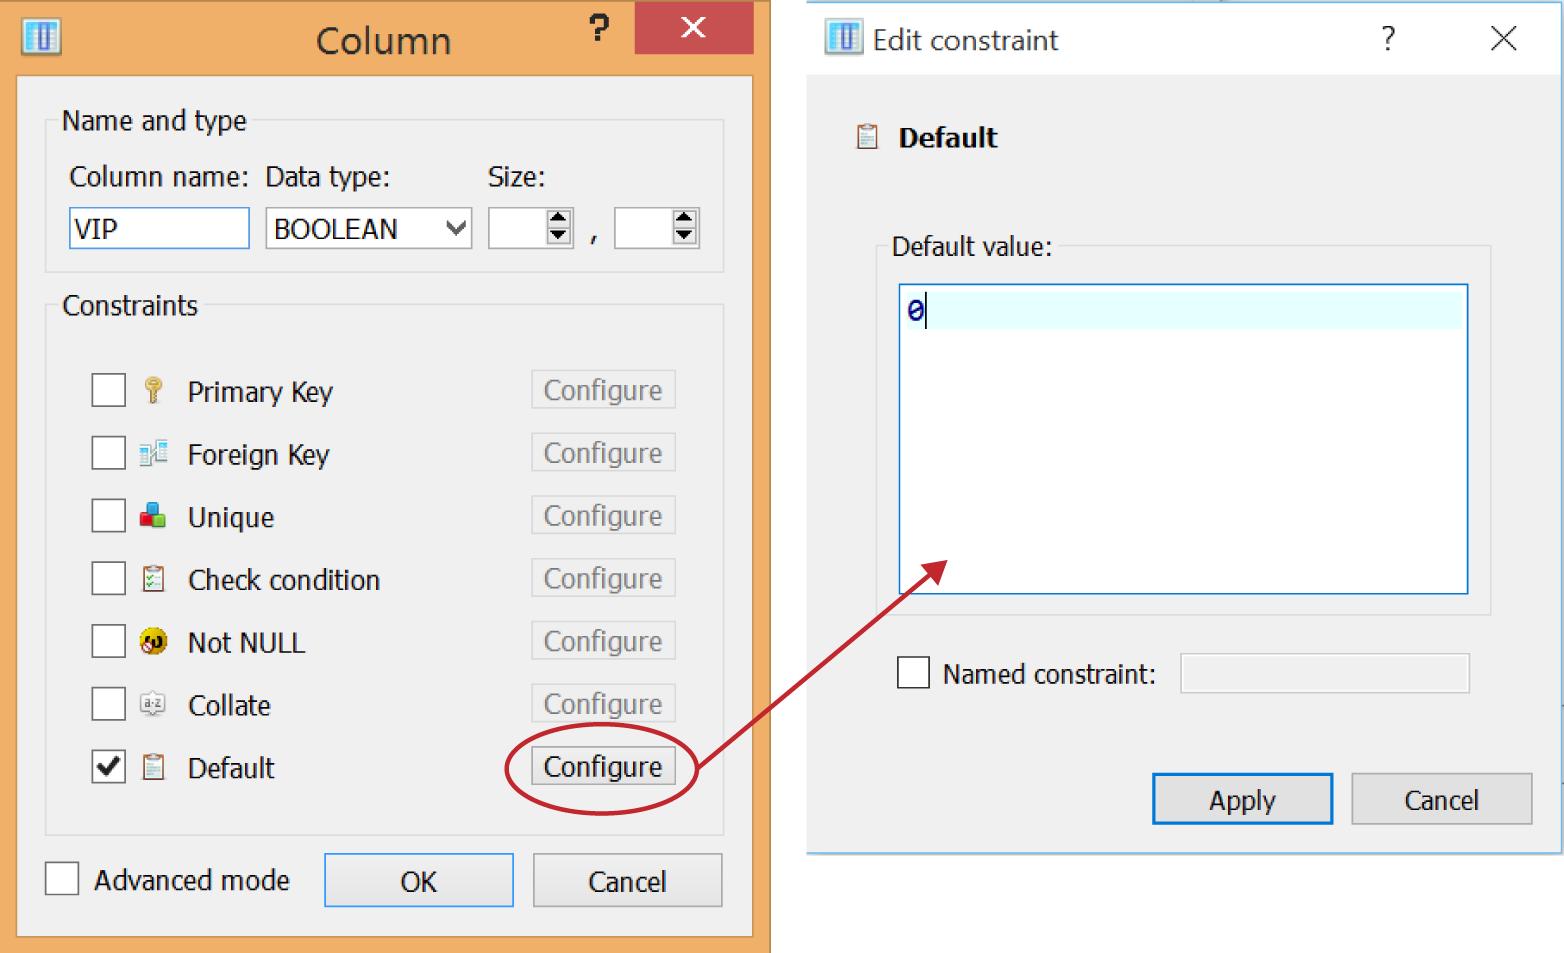 Setting a default value for a column